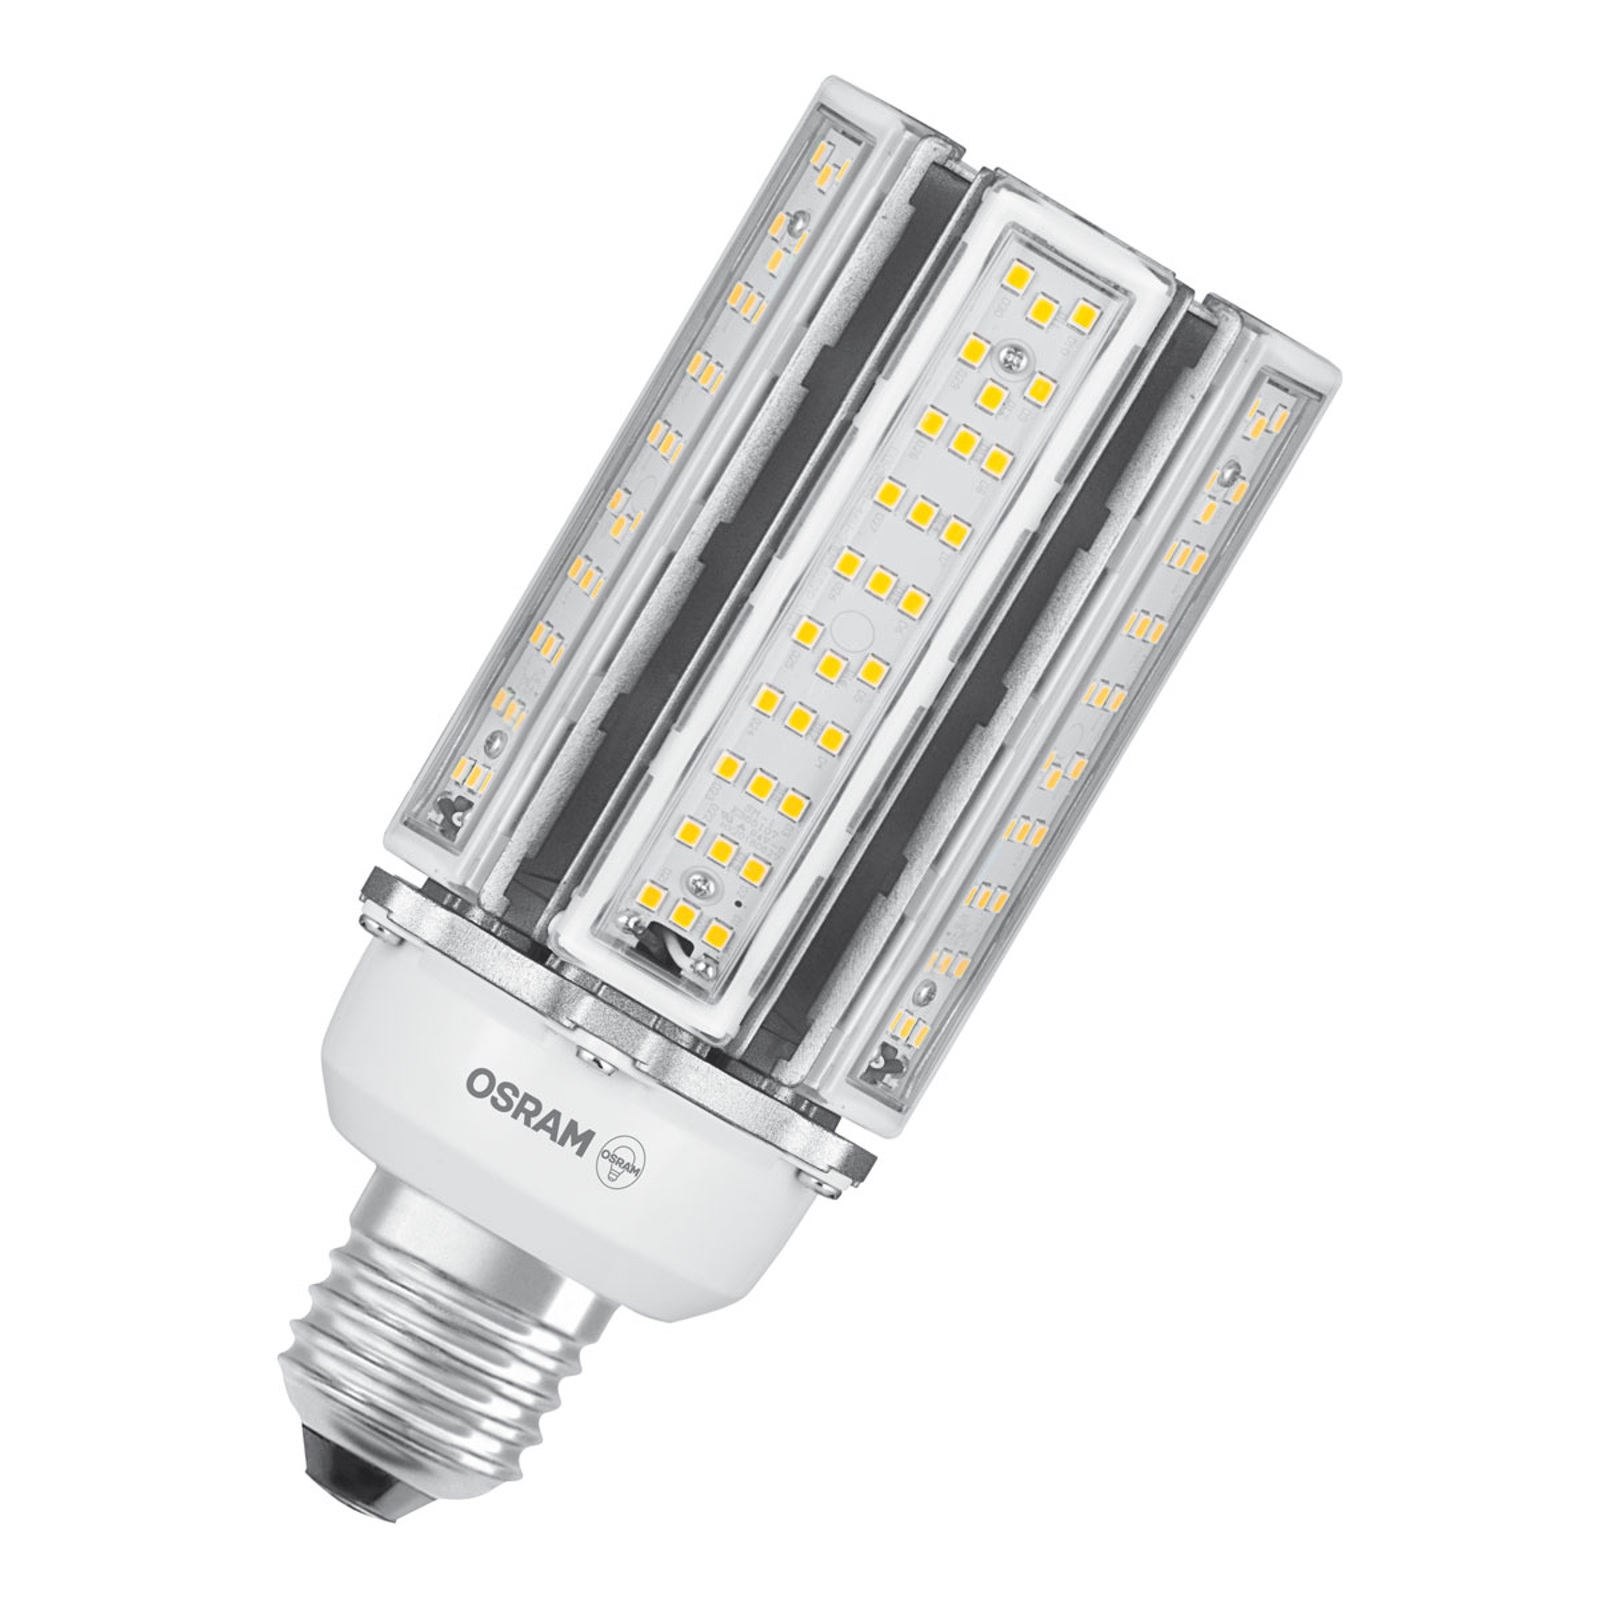 OSRAM żarówka LED E40 Parathom HQL 46W 2700K